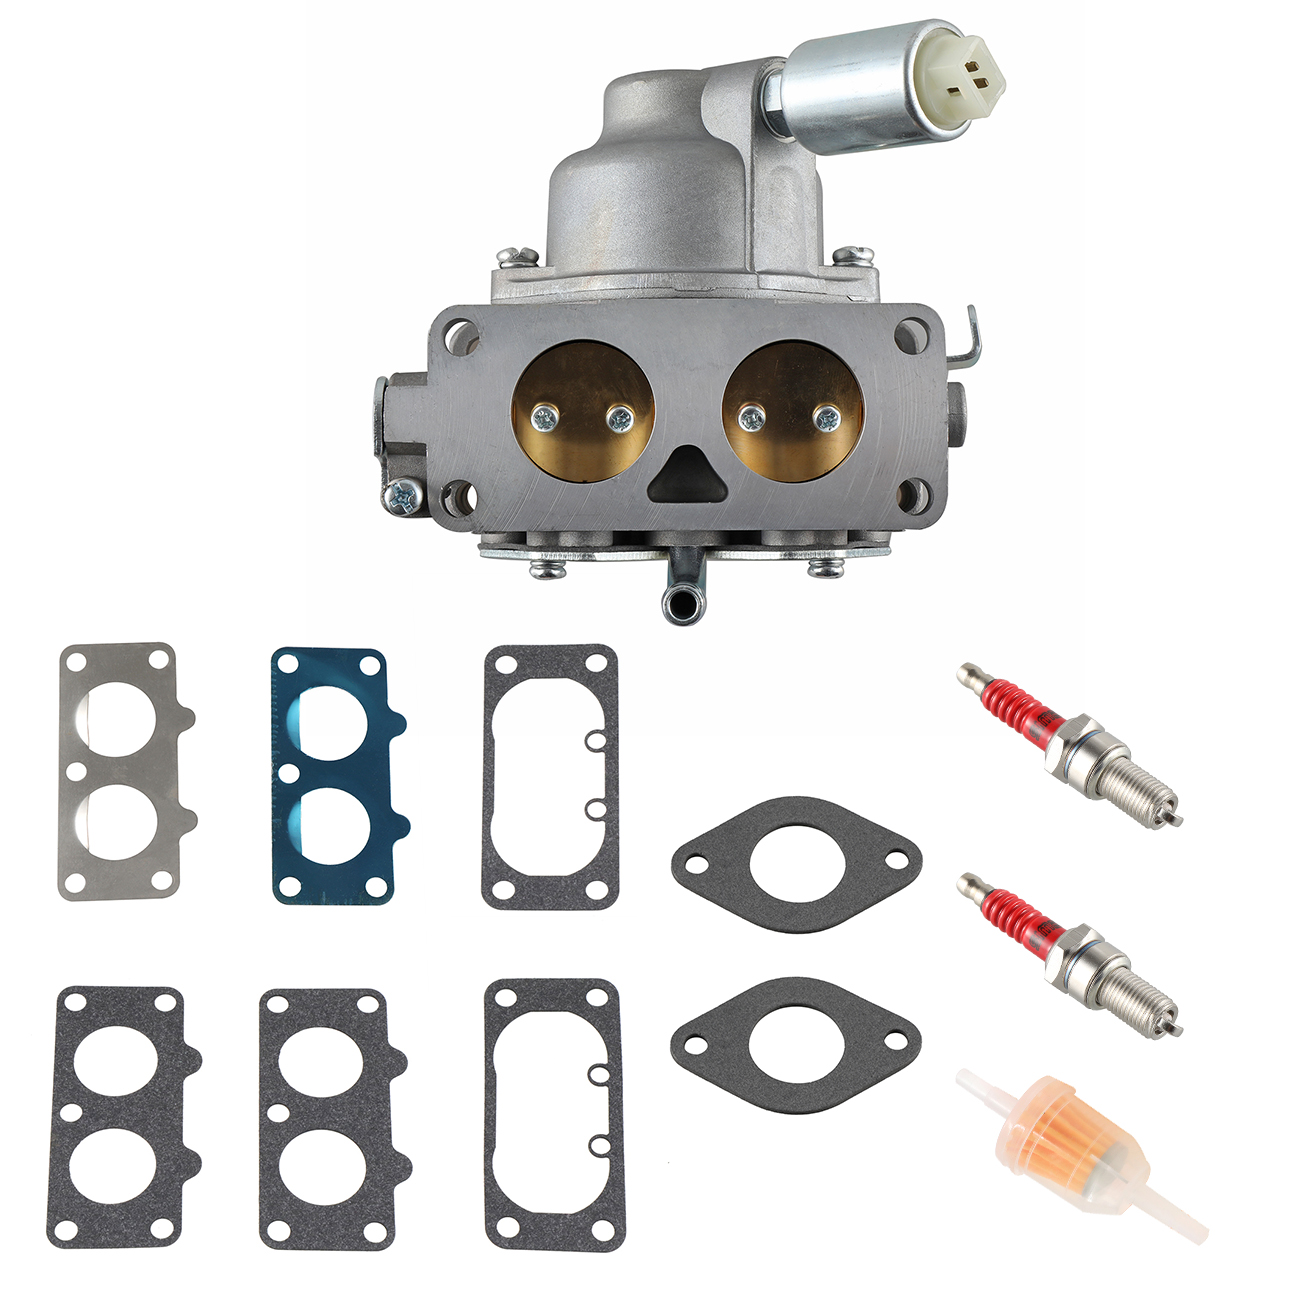 Carburateur Nettoyage Brosse Pour BS 20-25hp 699709 499804 791230 799230 - 4